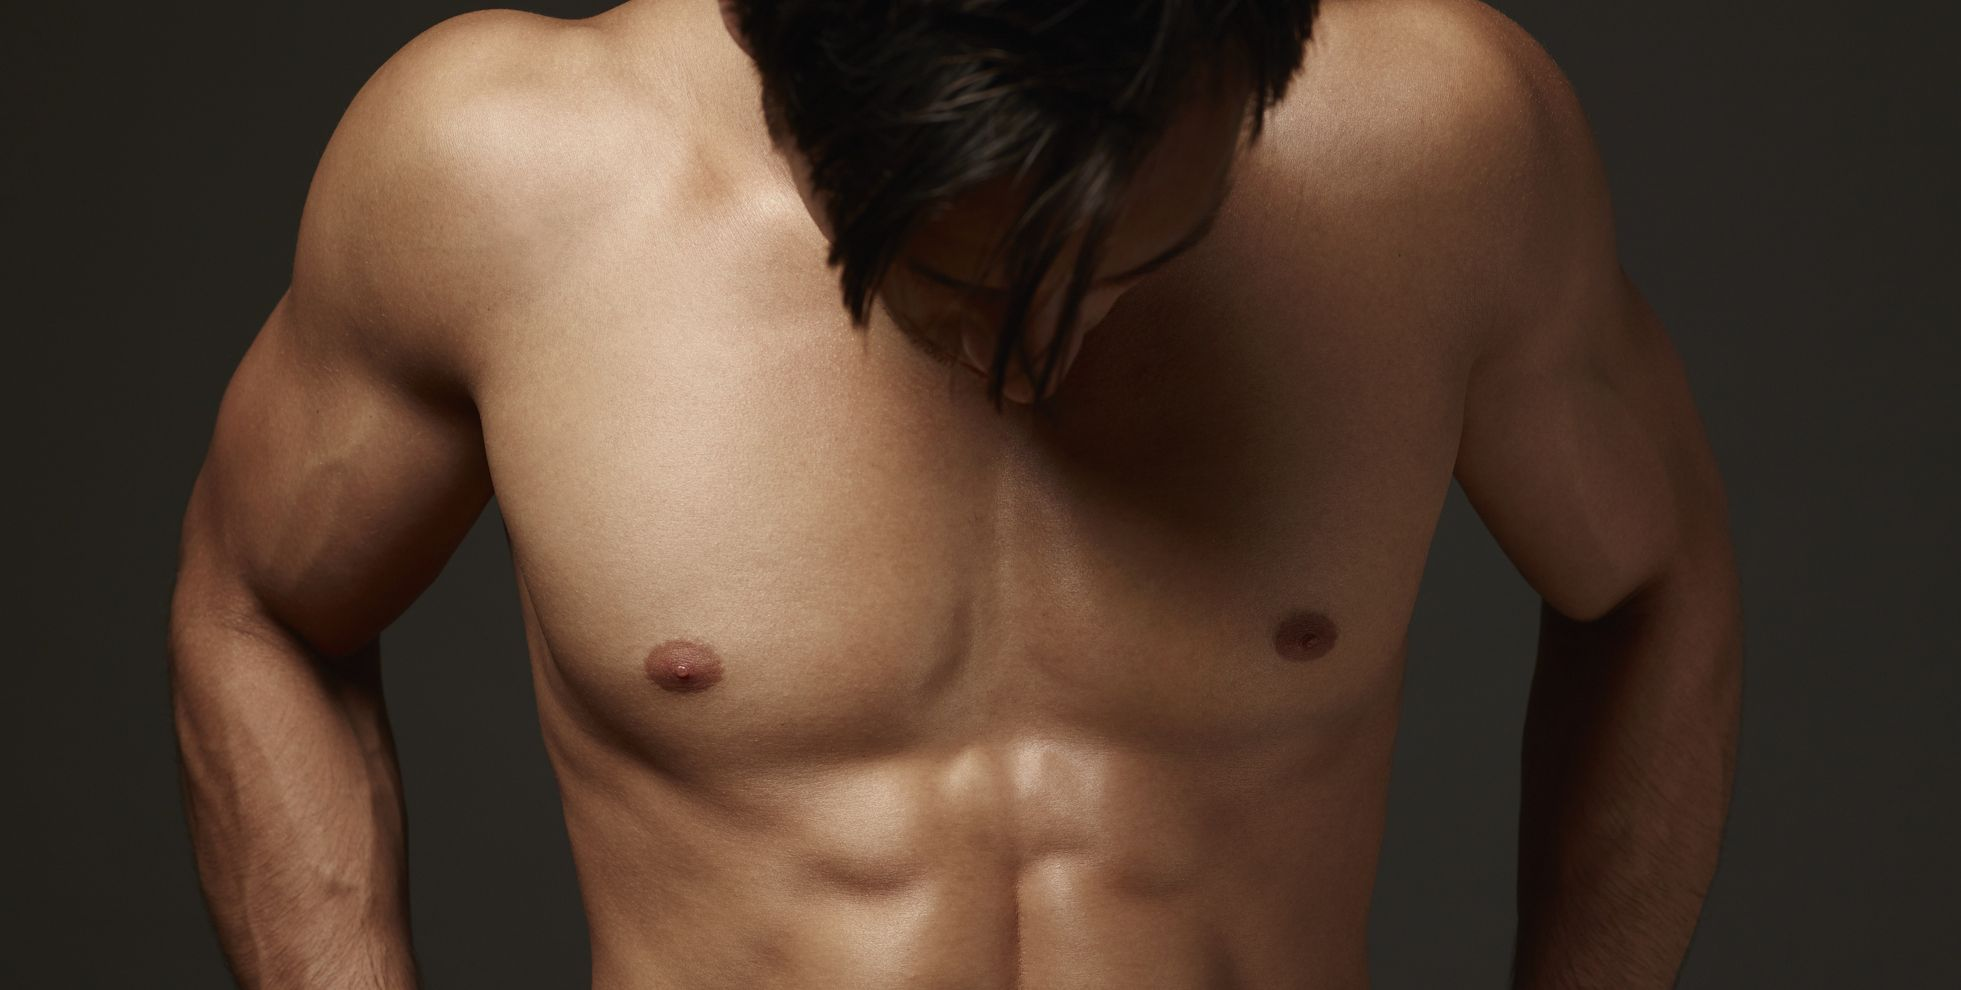 torso depilado